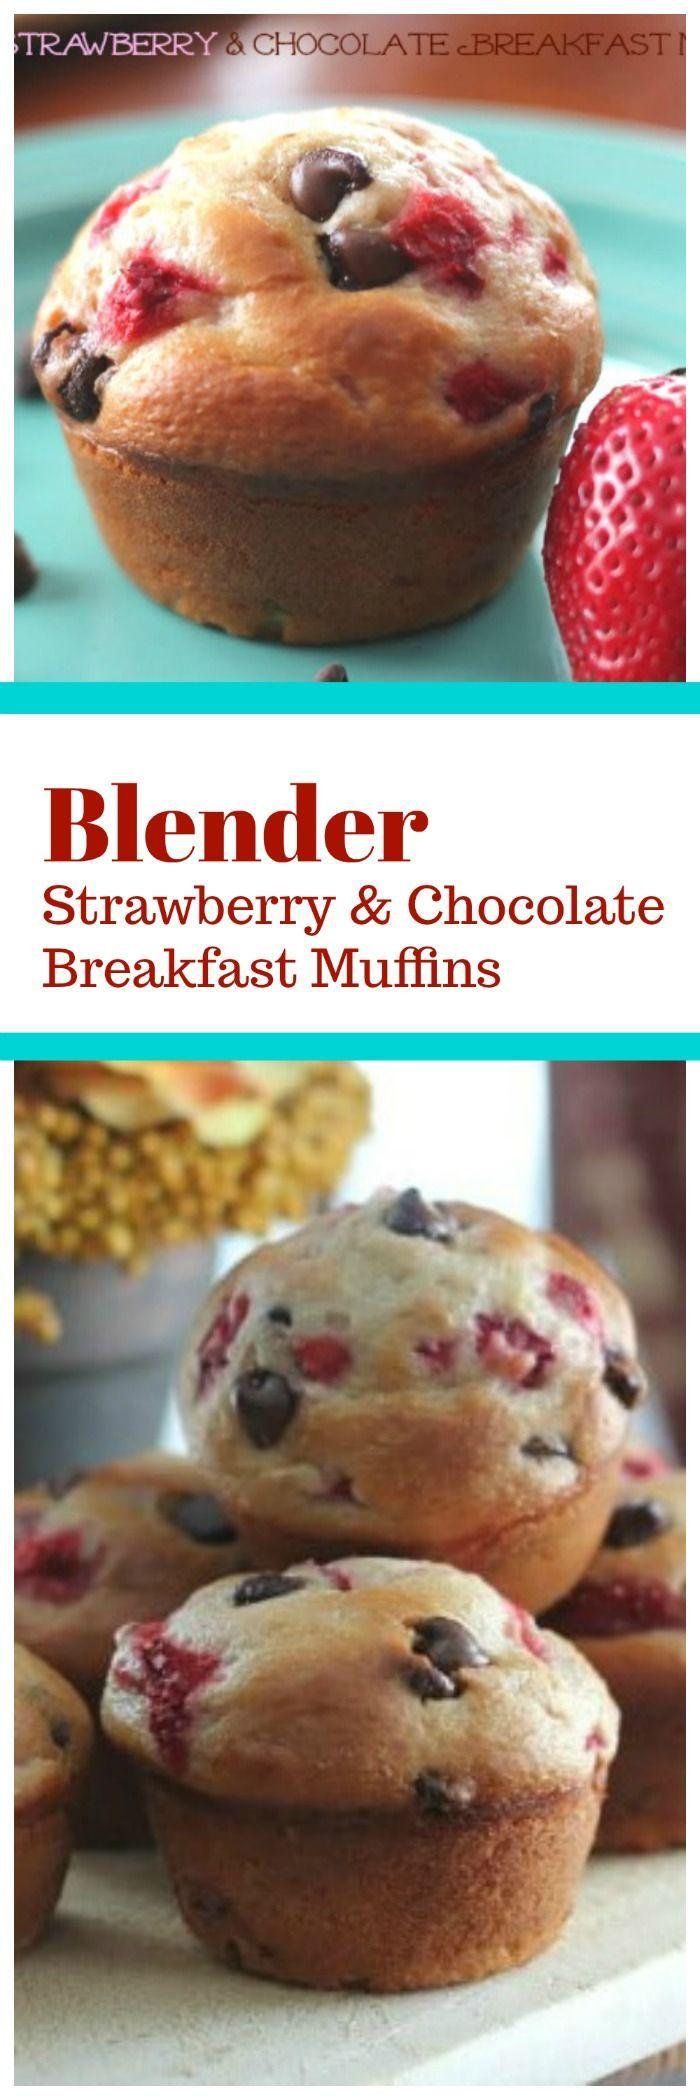 Blender Strawberry & Chocolate Breakfast Muffins {…